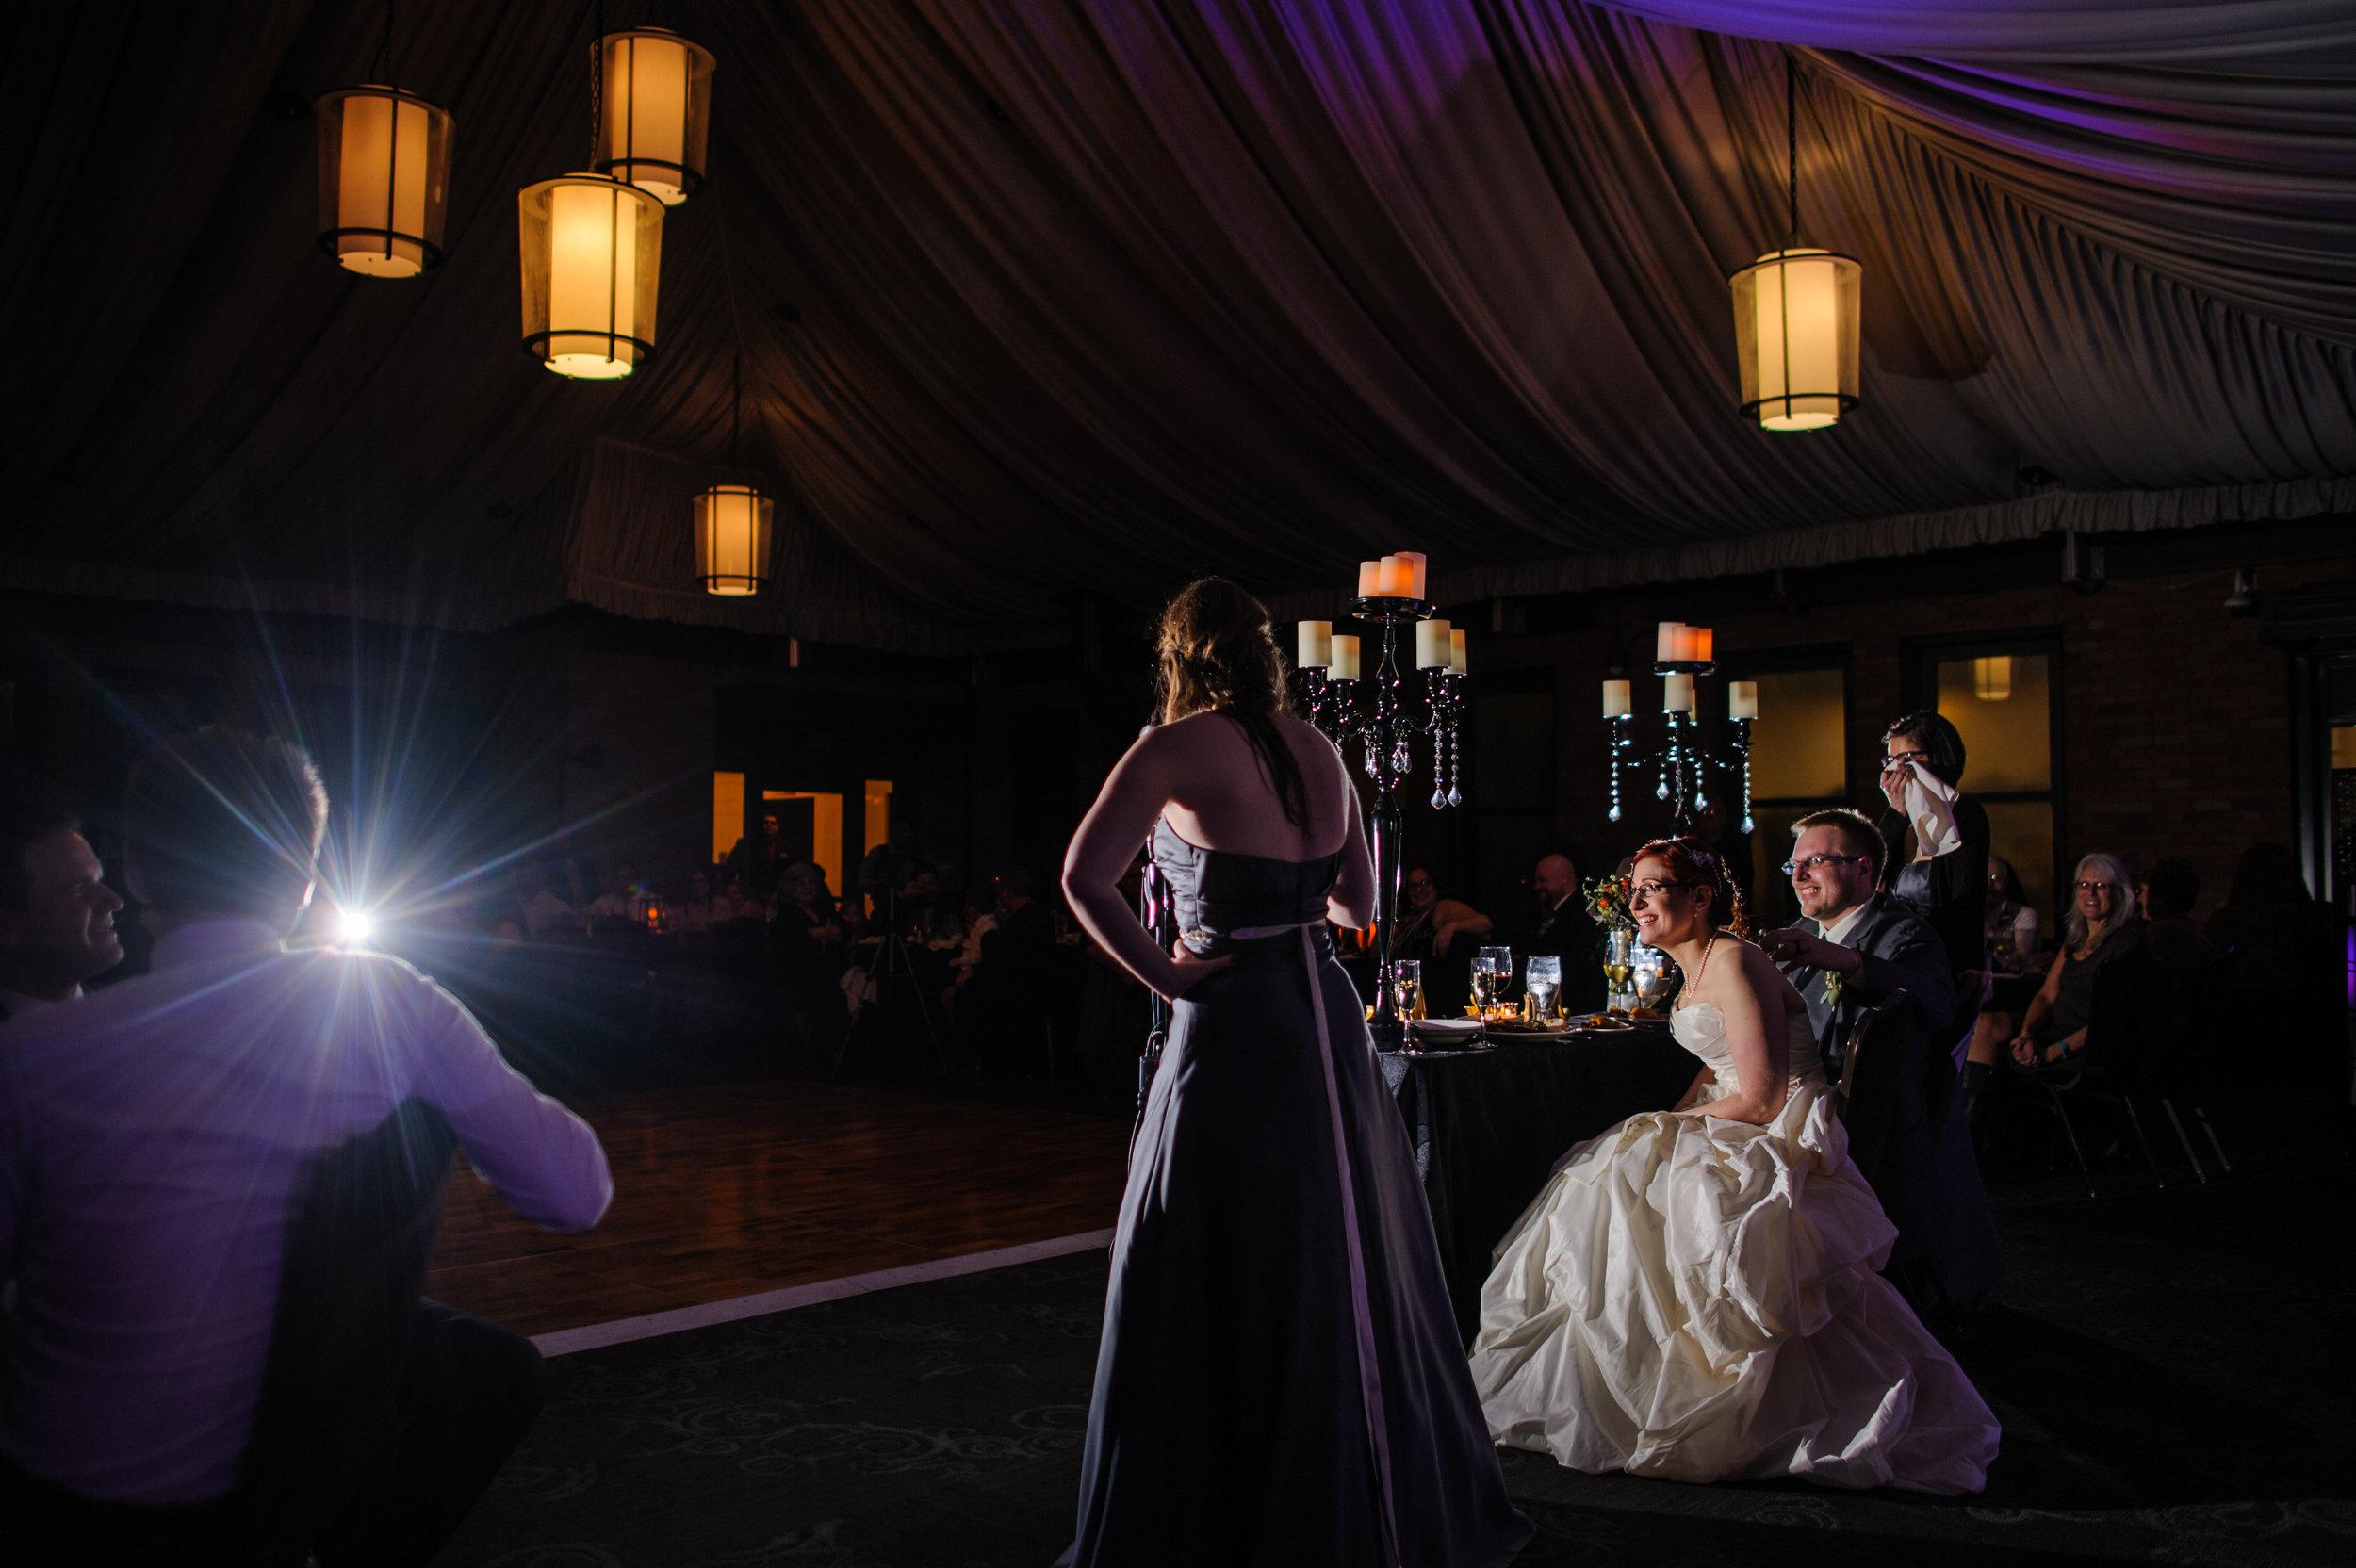 judith-john-008-citizen-hotel-sacramento-wedding-photographer-katherine-nicole-photography.JPG